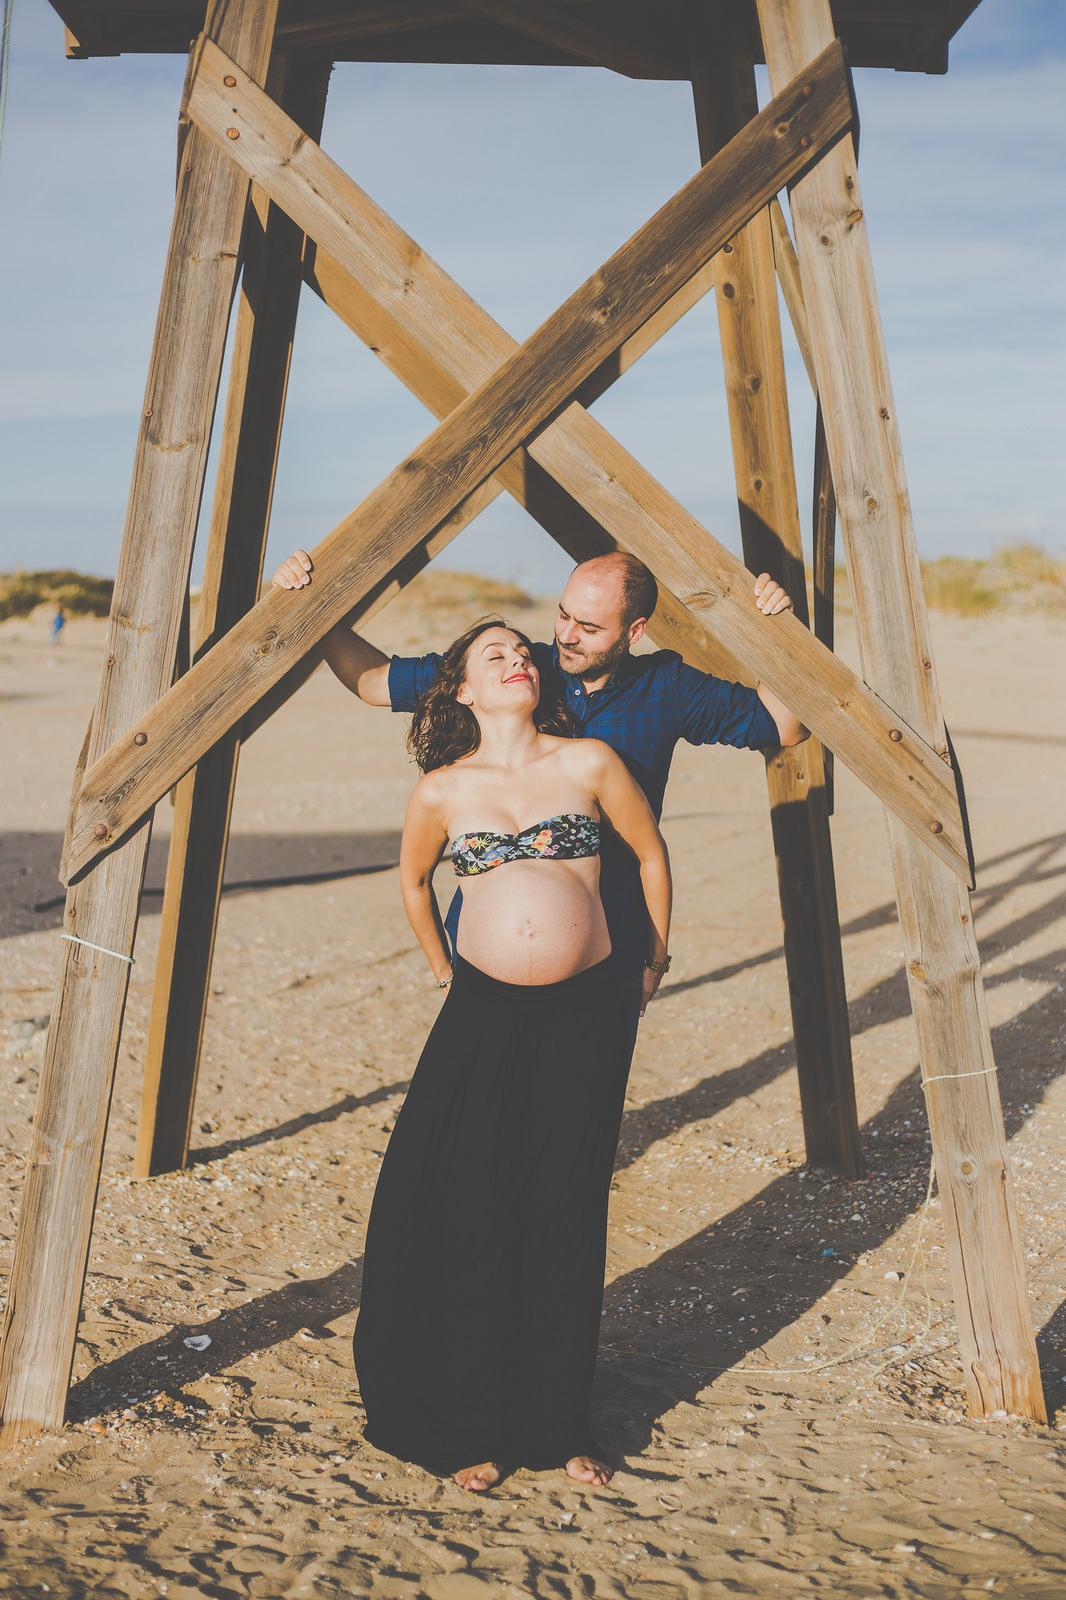 sesion embarazo silvia orduna fotografia huelva playa 14